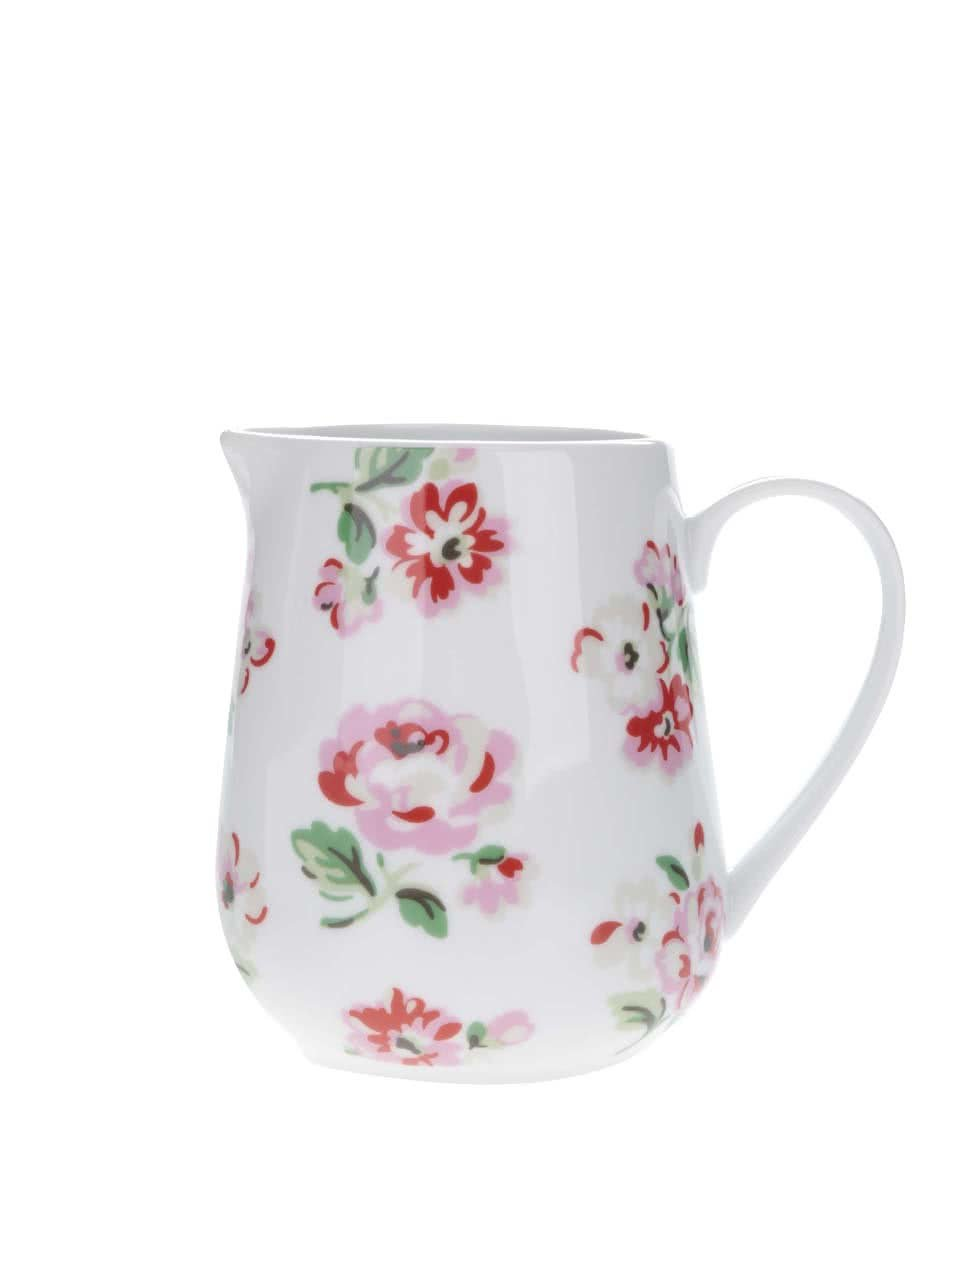 Bílá konvička na mléko s potiskem květin Cath Kidston